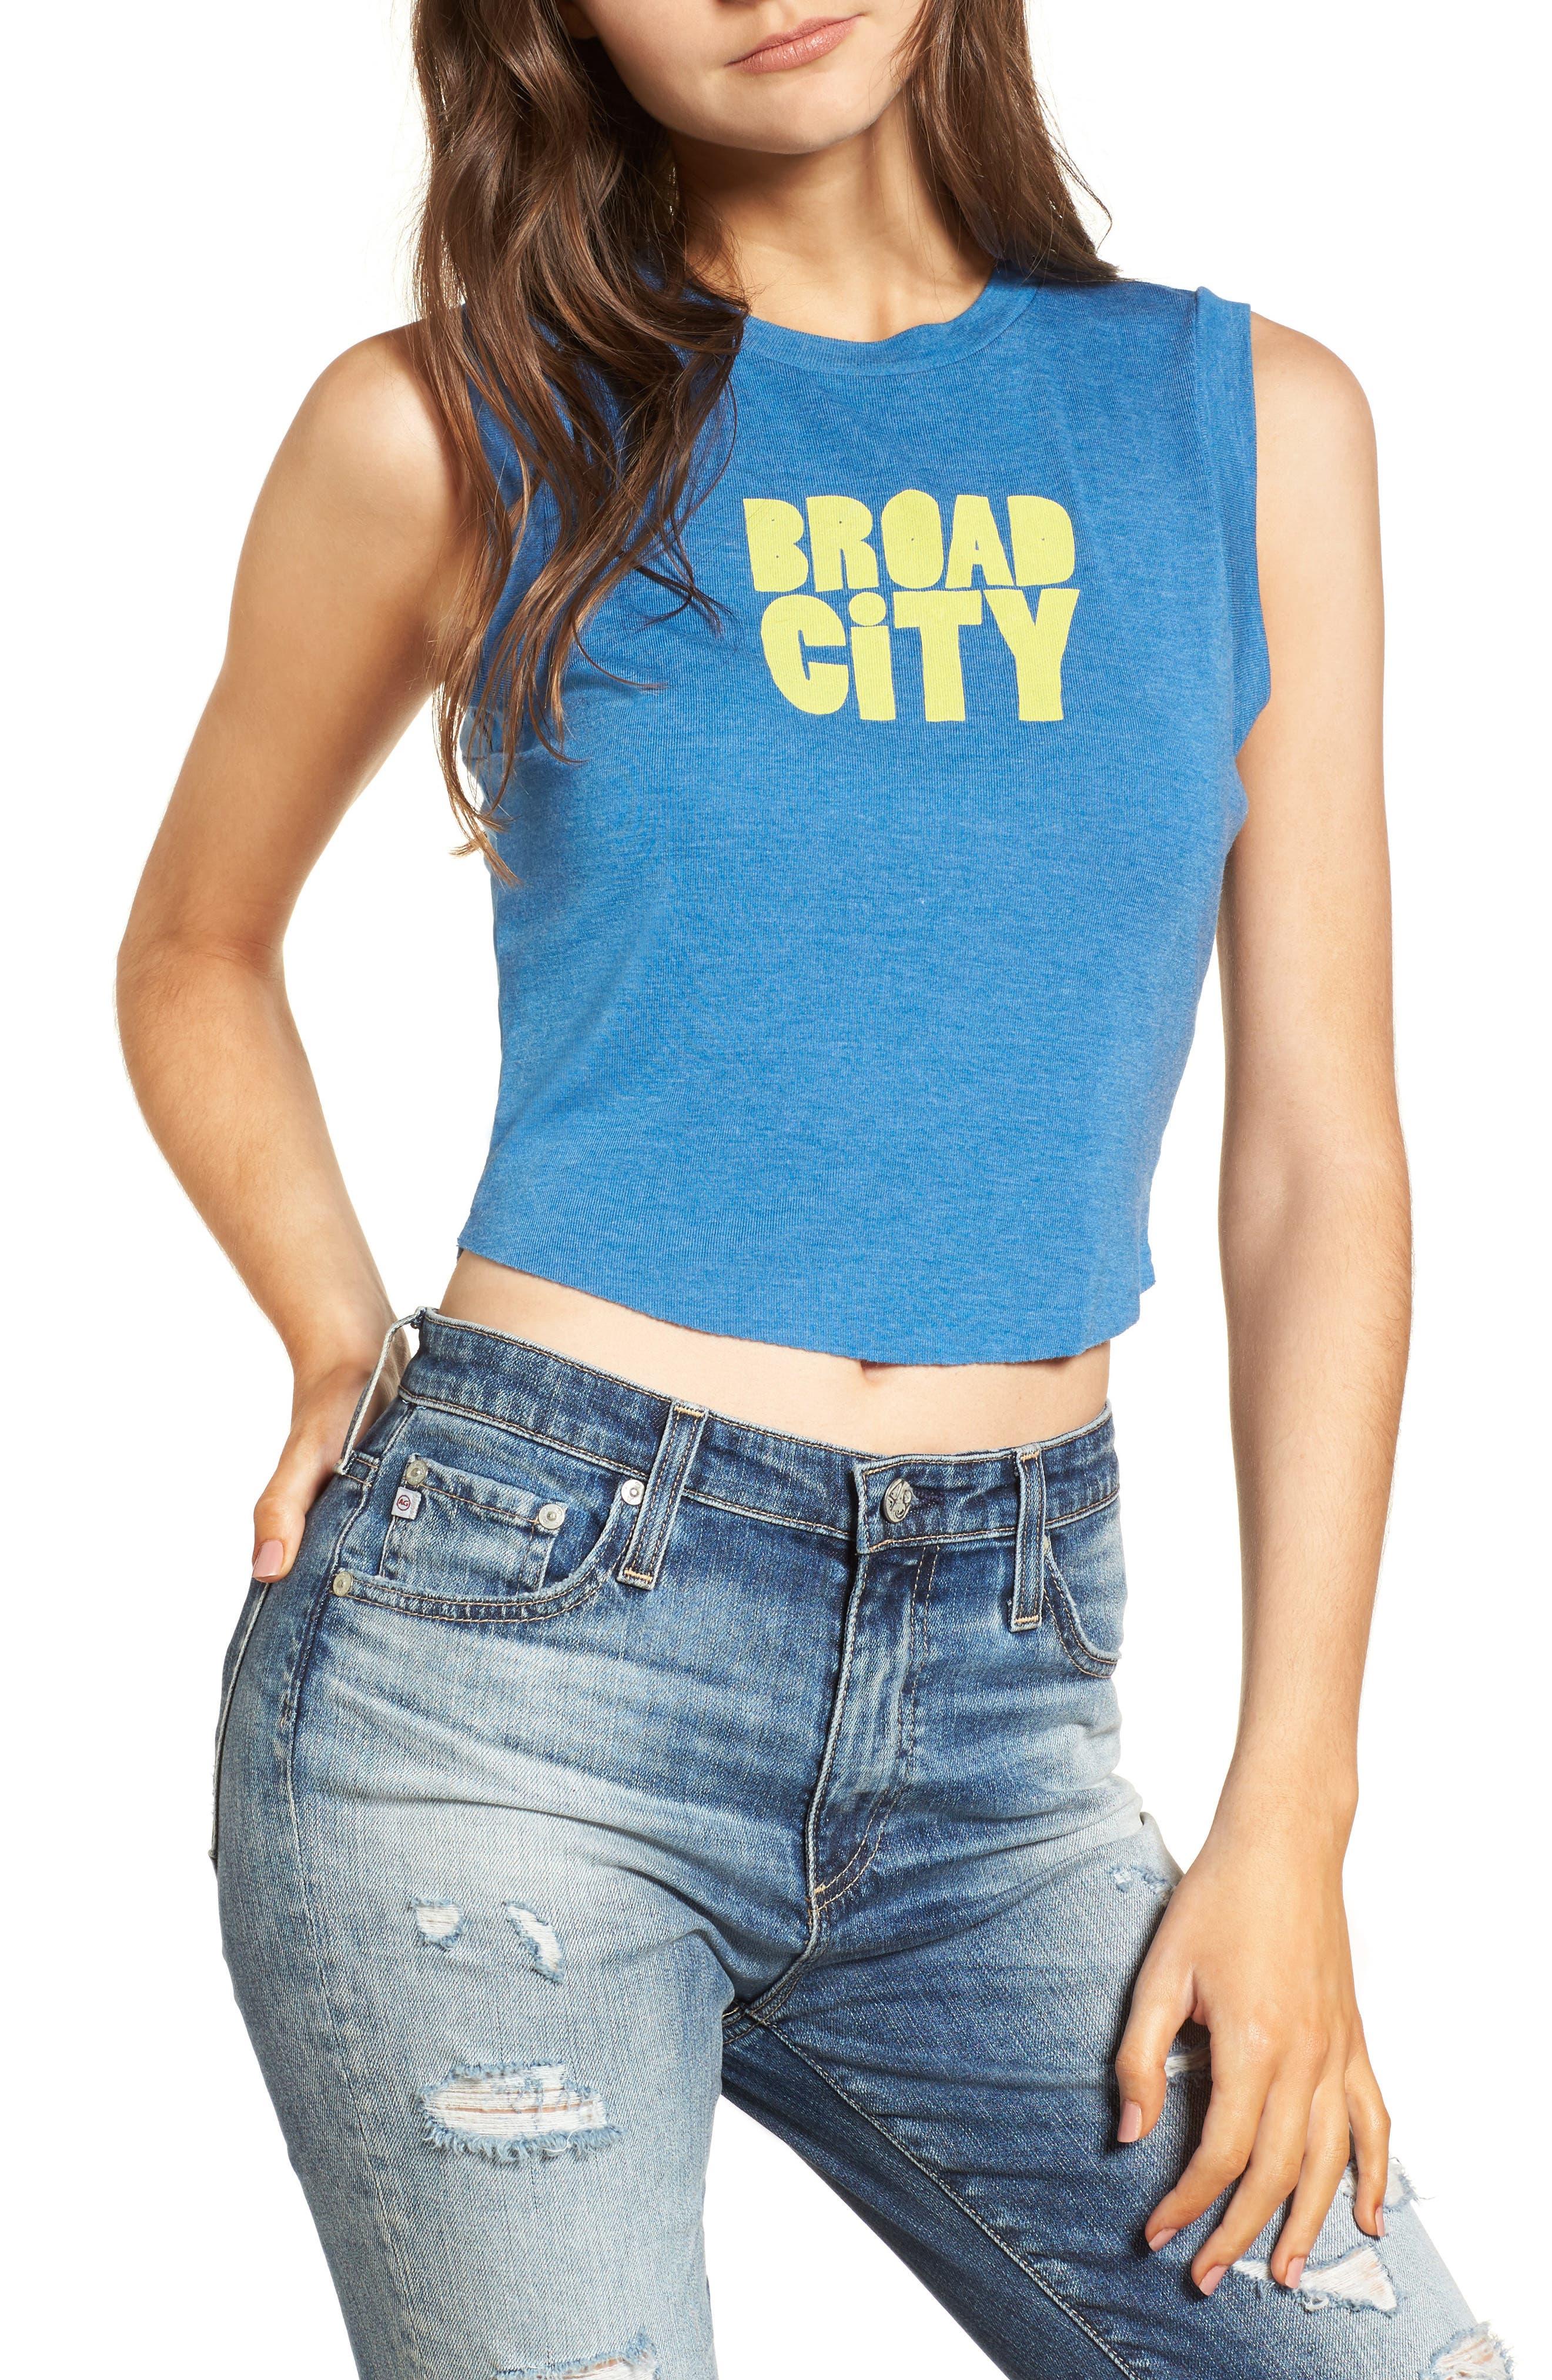 Main Image - Wildfox Broad City Keaton Tank